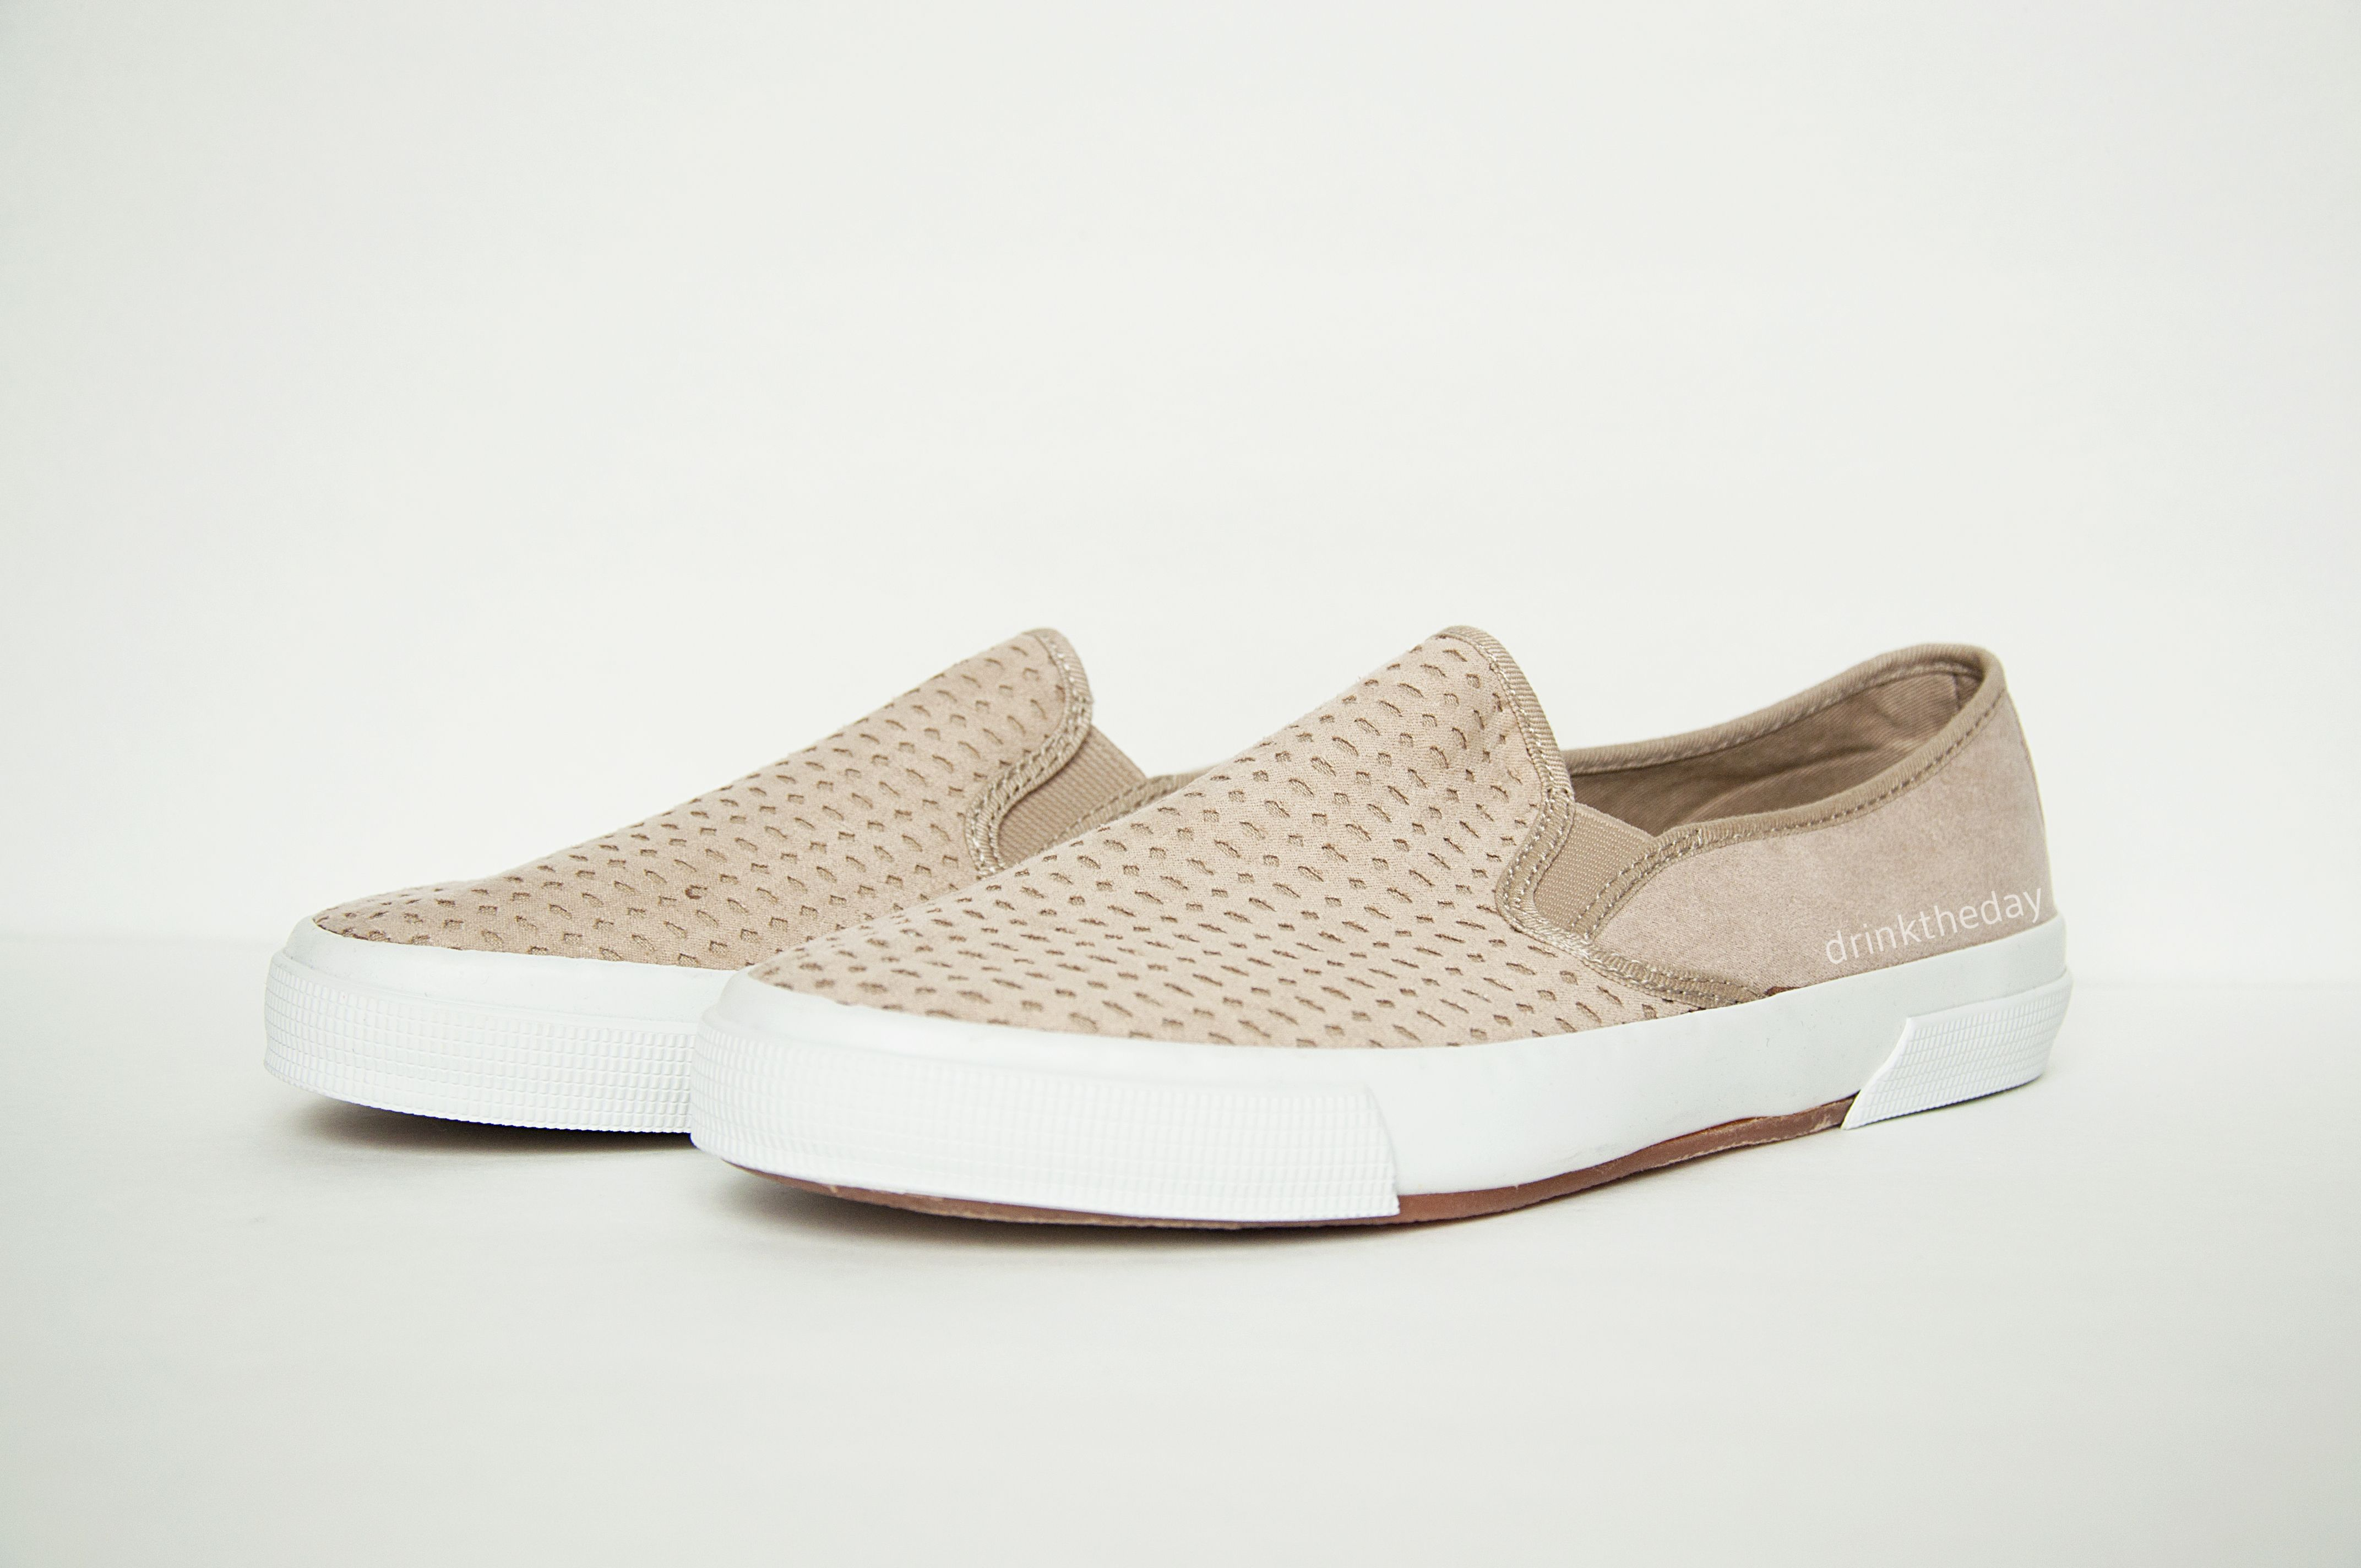 Old Navy   Slip on shoes, Slip